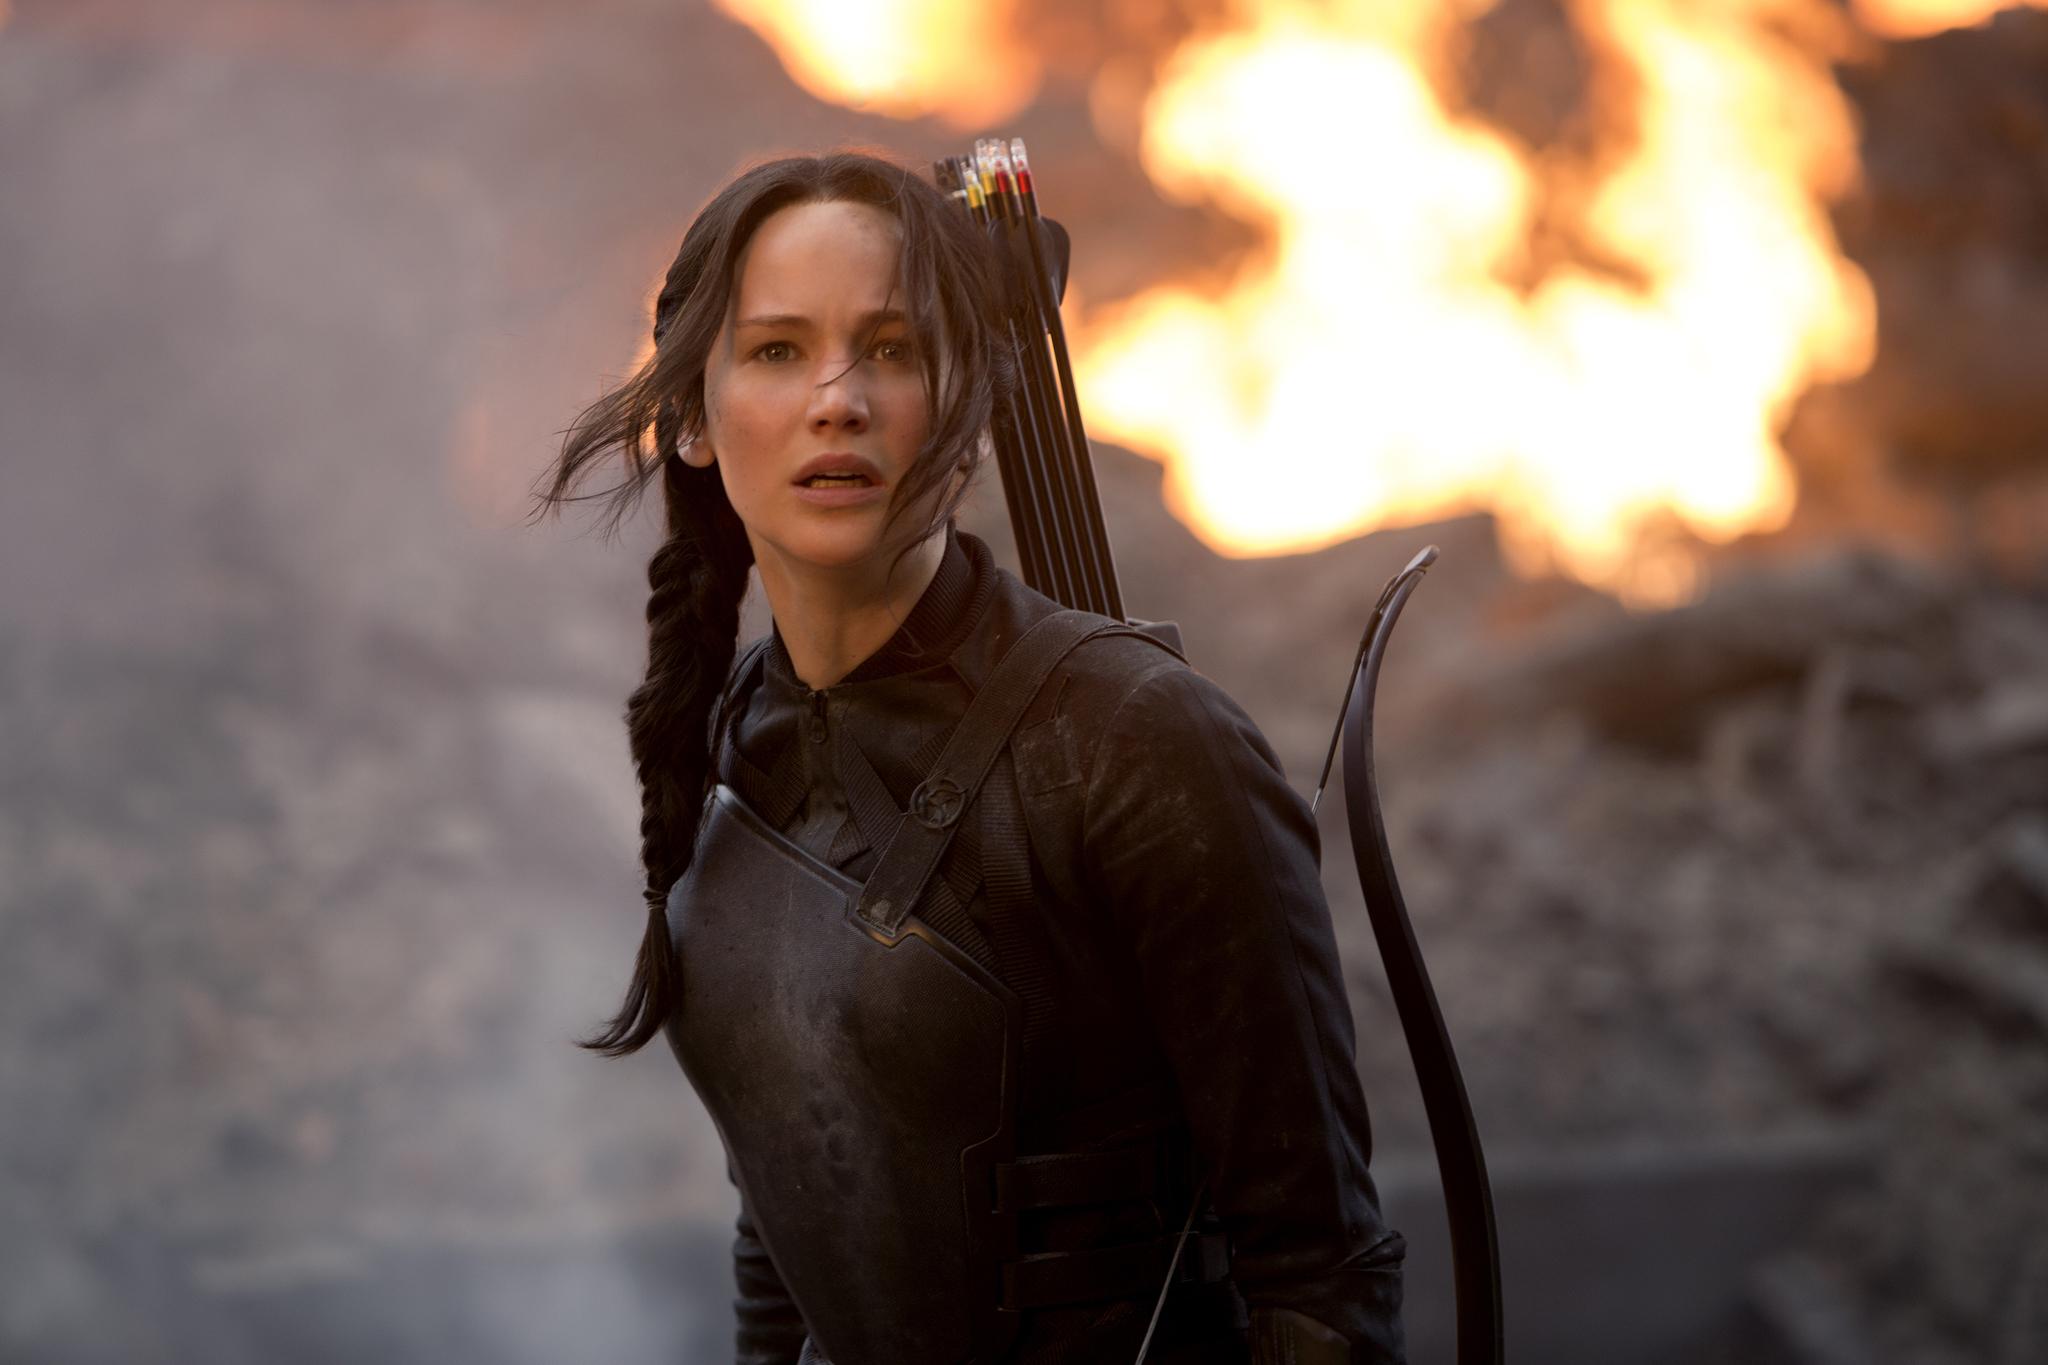 Jennifer Lawrence in The Hunger Games: Mockingjay - Part 1 (2014)